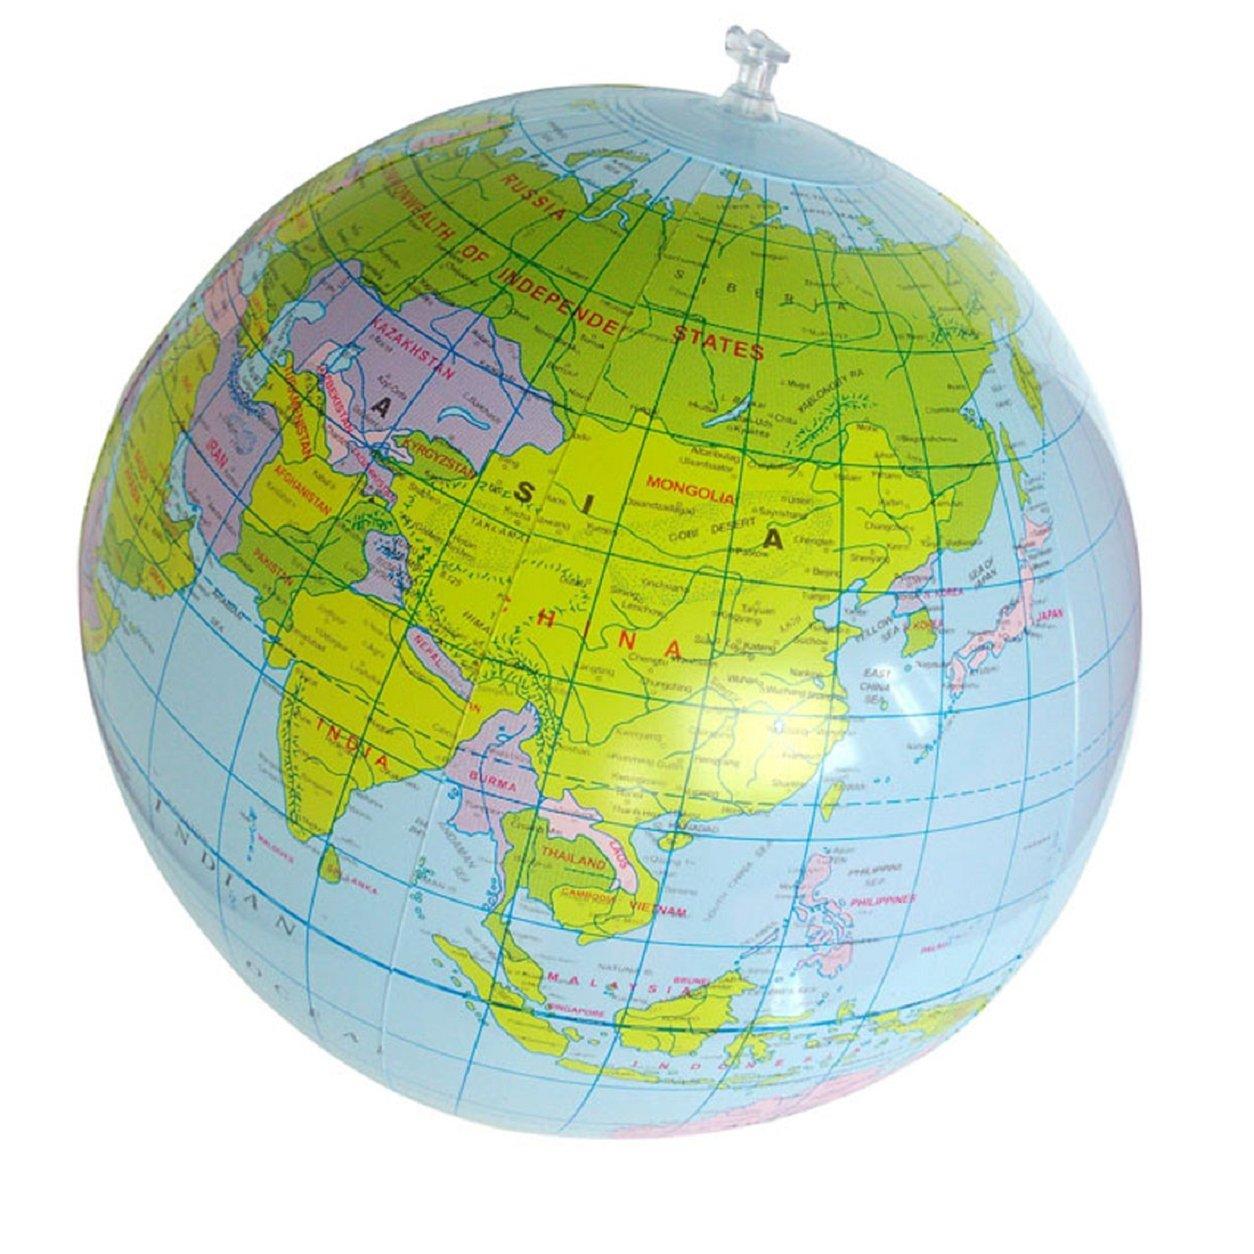 Mallon 40cm inflatable world globe teach education geography toy mallon 40cm inflatable world globe teach education geography toy map balloon beach ball amazon toys games gumiabroncs Images